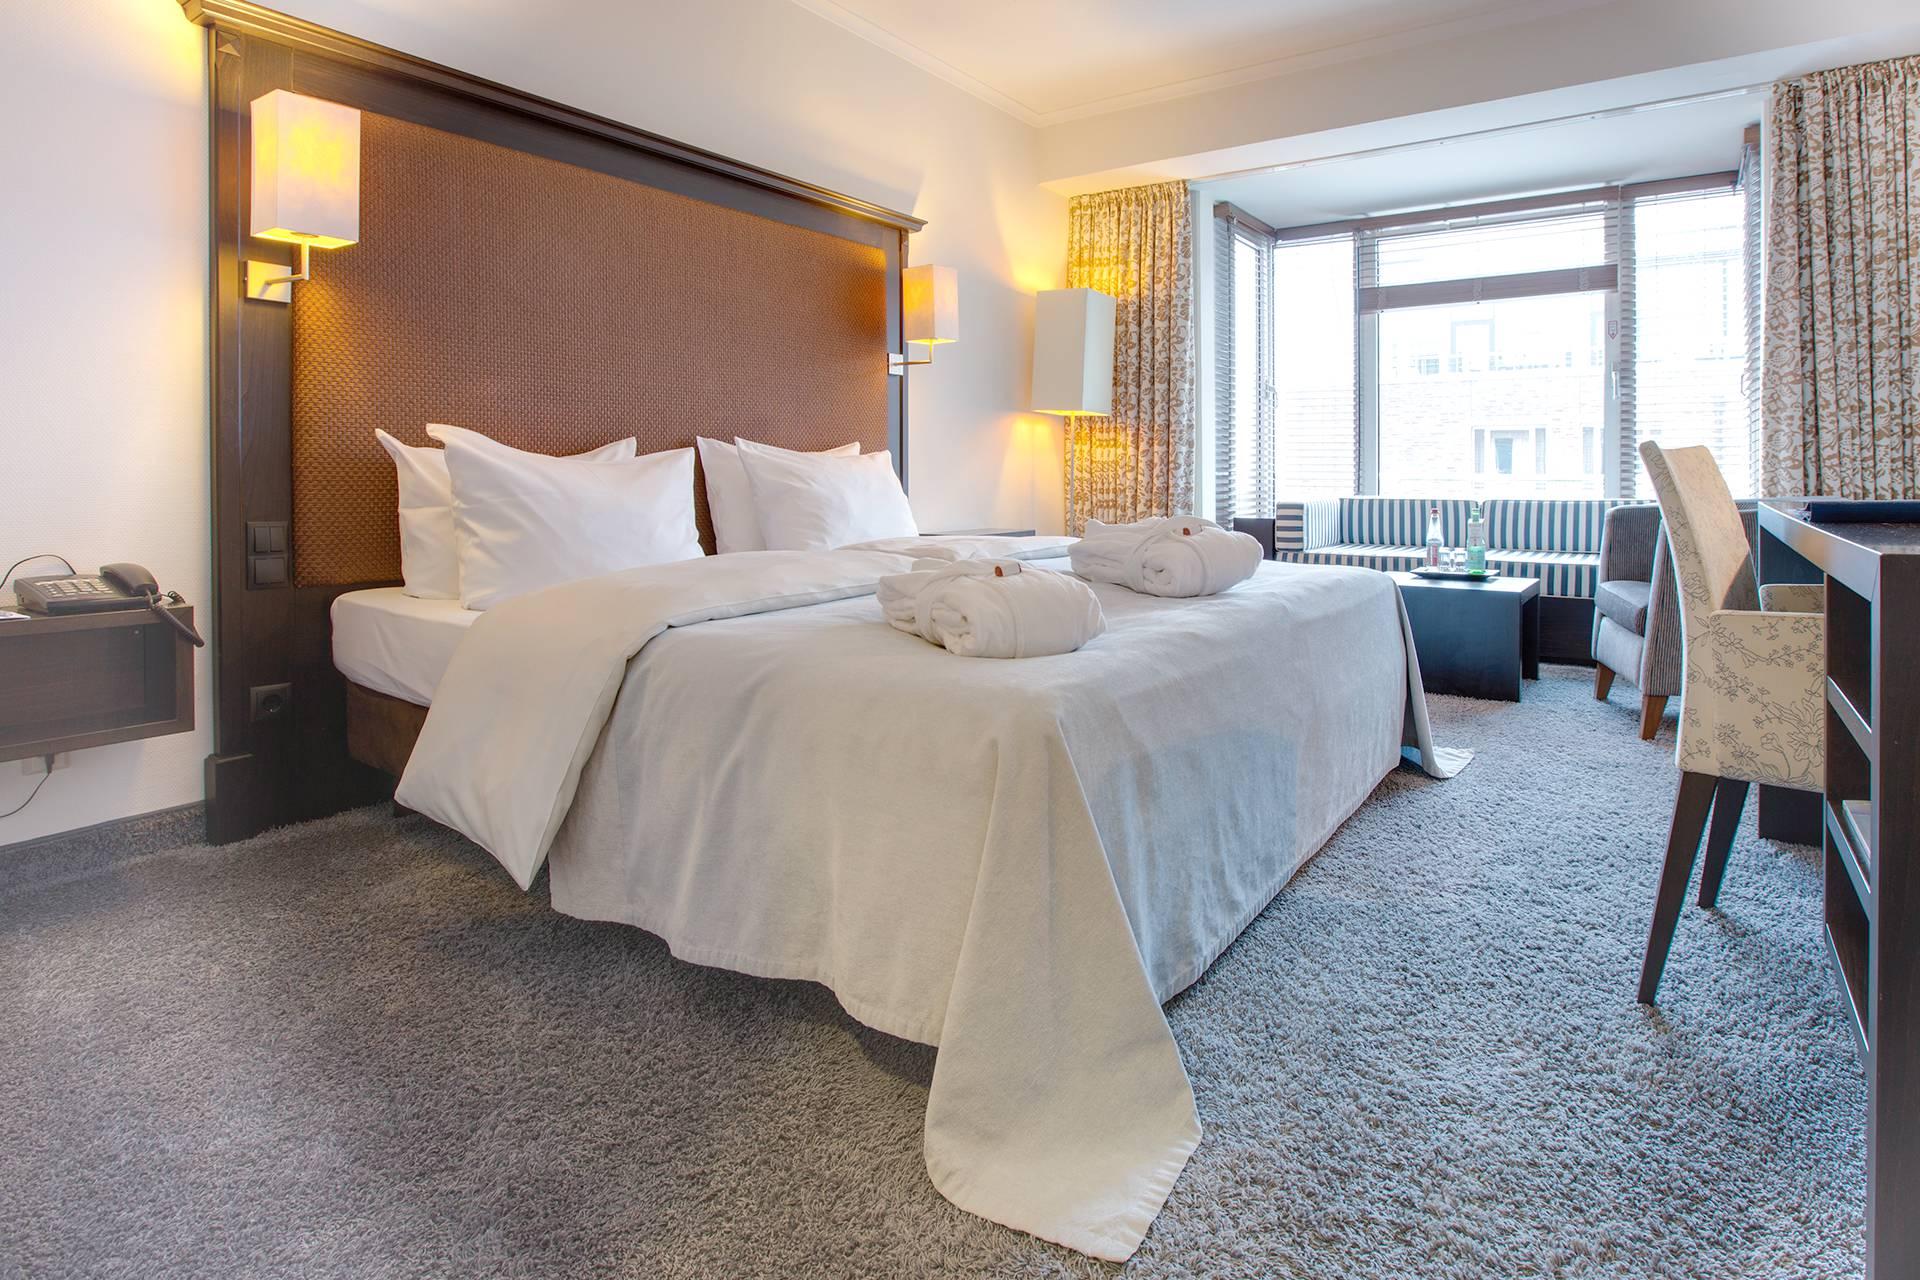 radisson senator hotel l beck conference hotel in the historic district. Black Bedroom Furniture Sets. Home Design Ideas